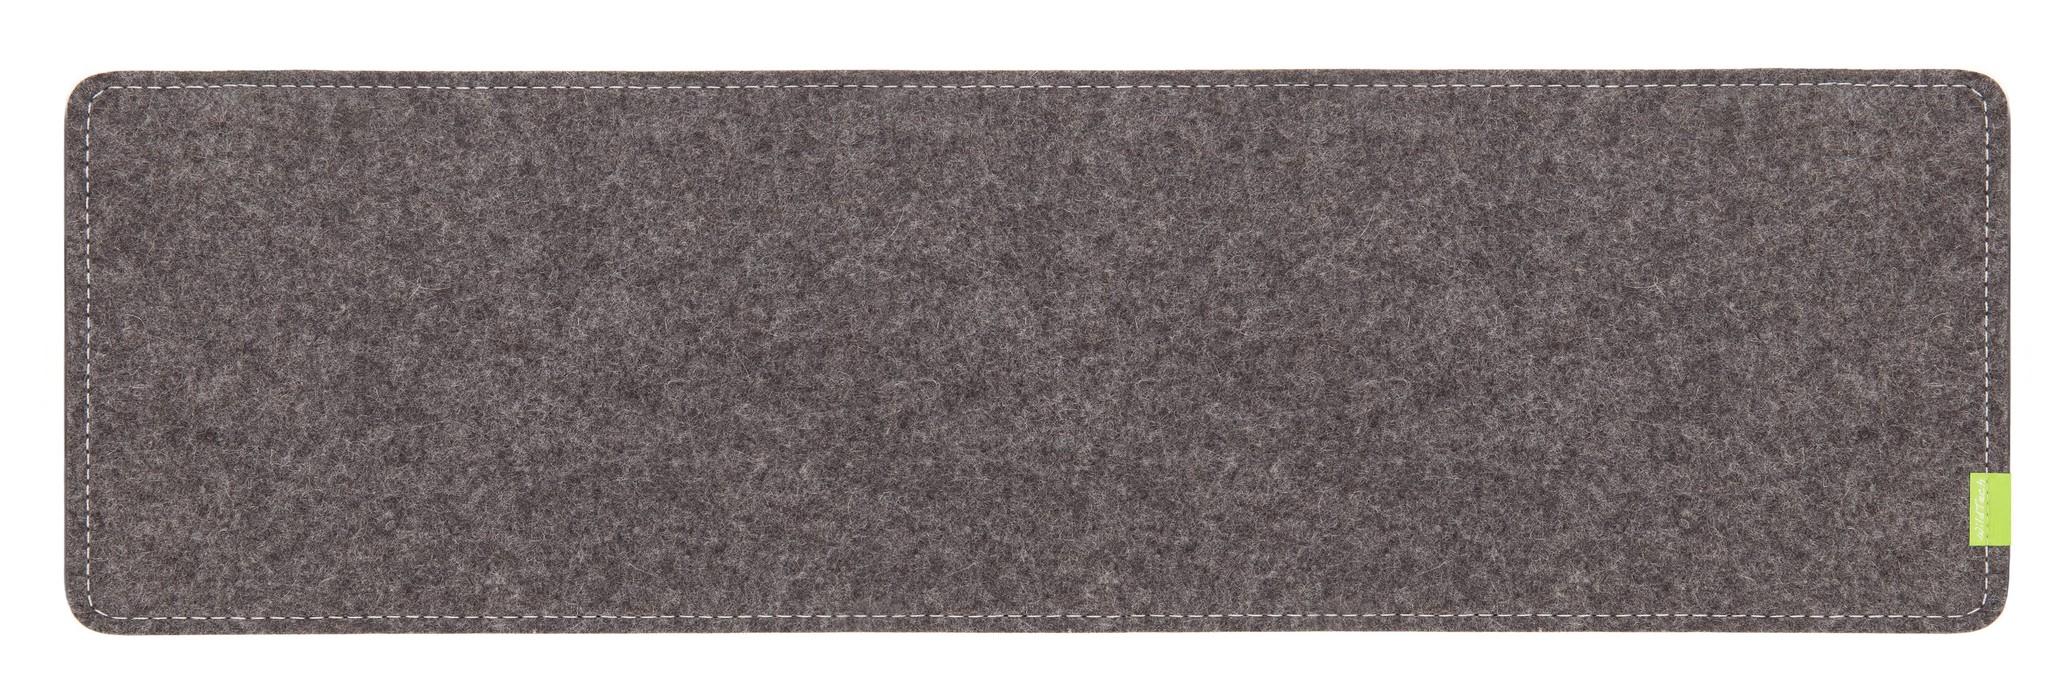 Underlay Gray-1